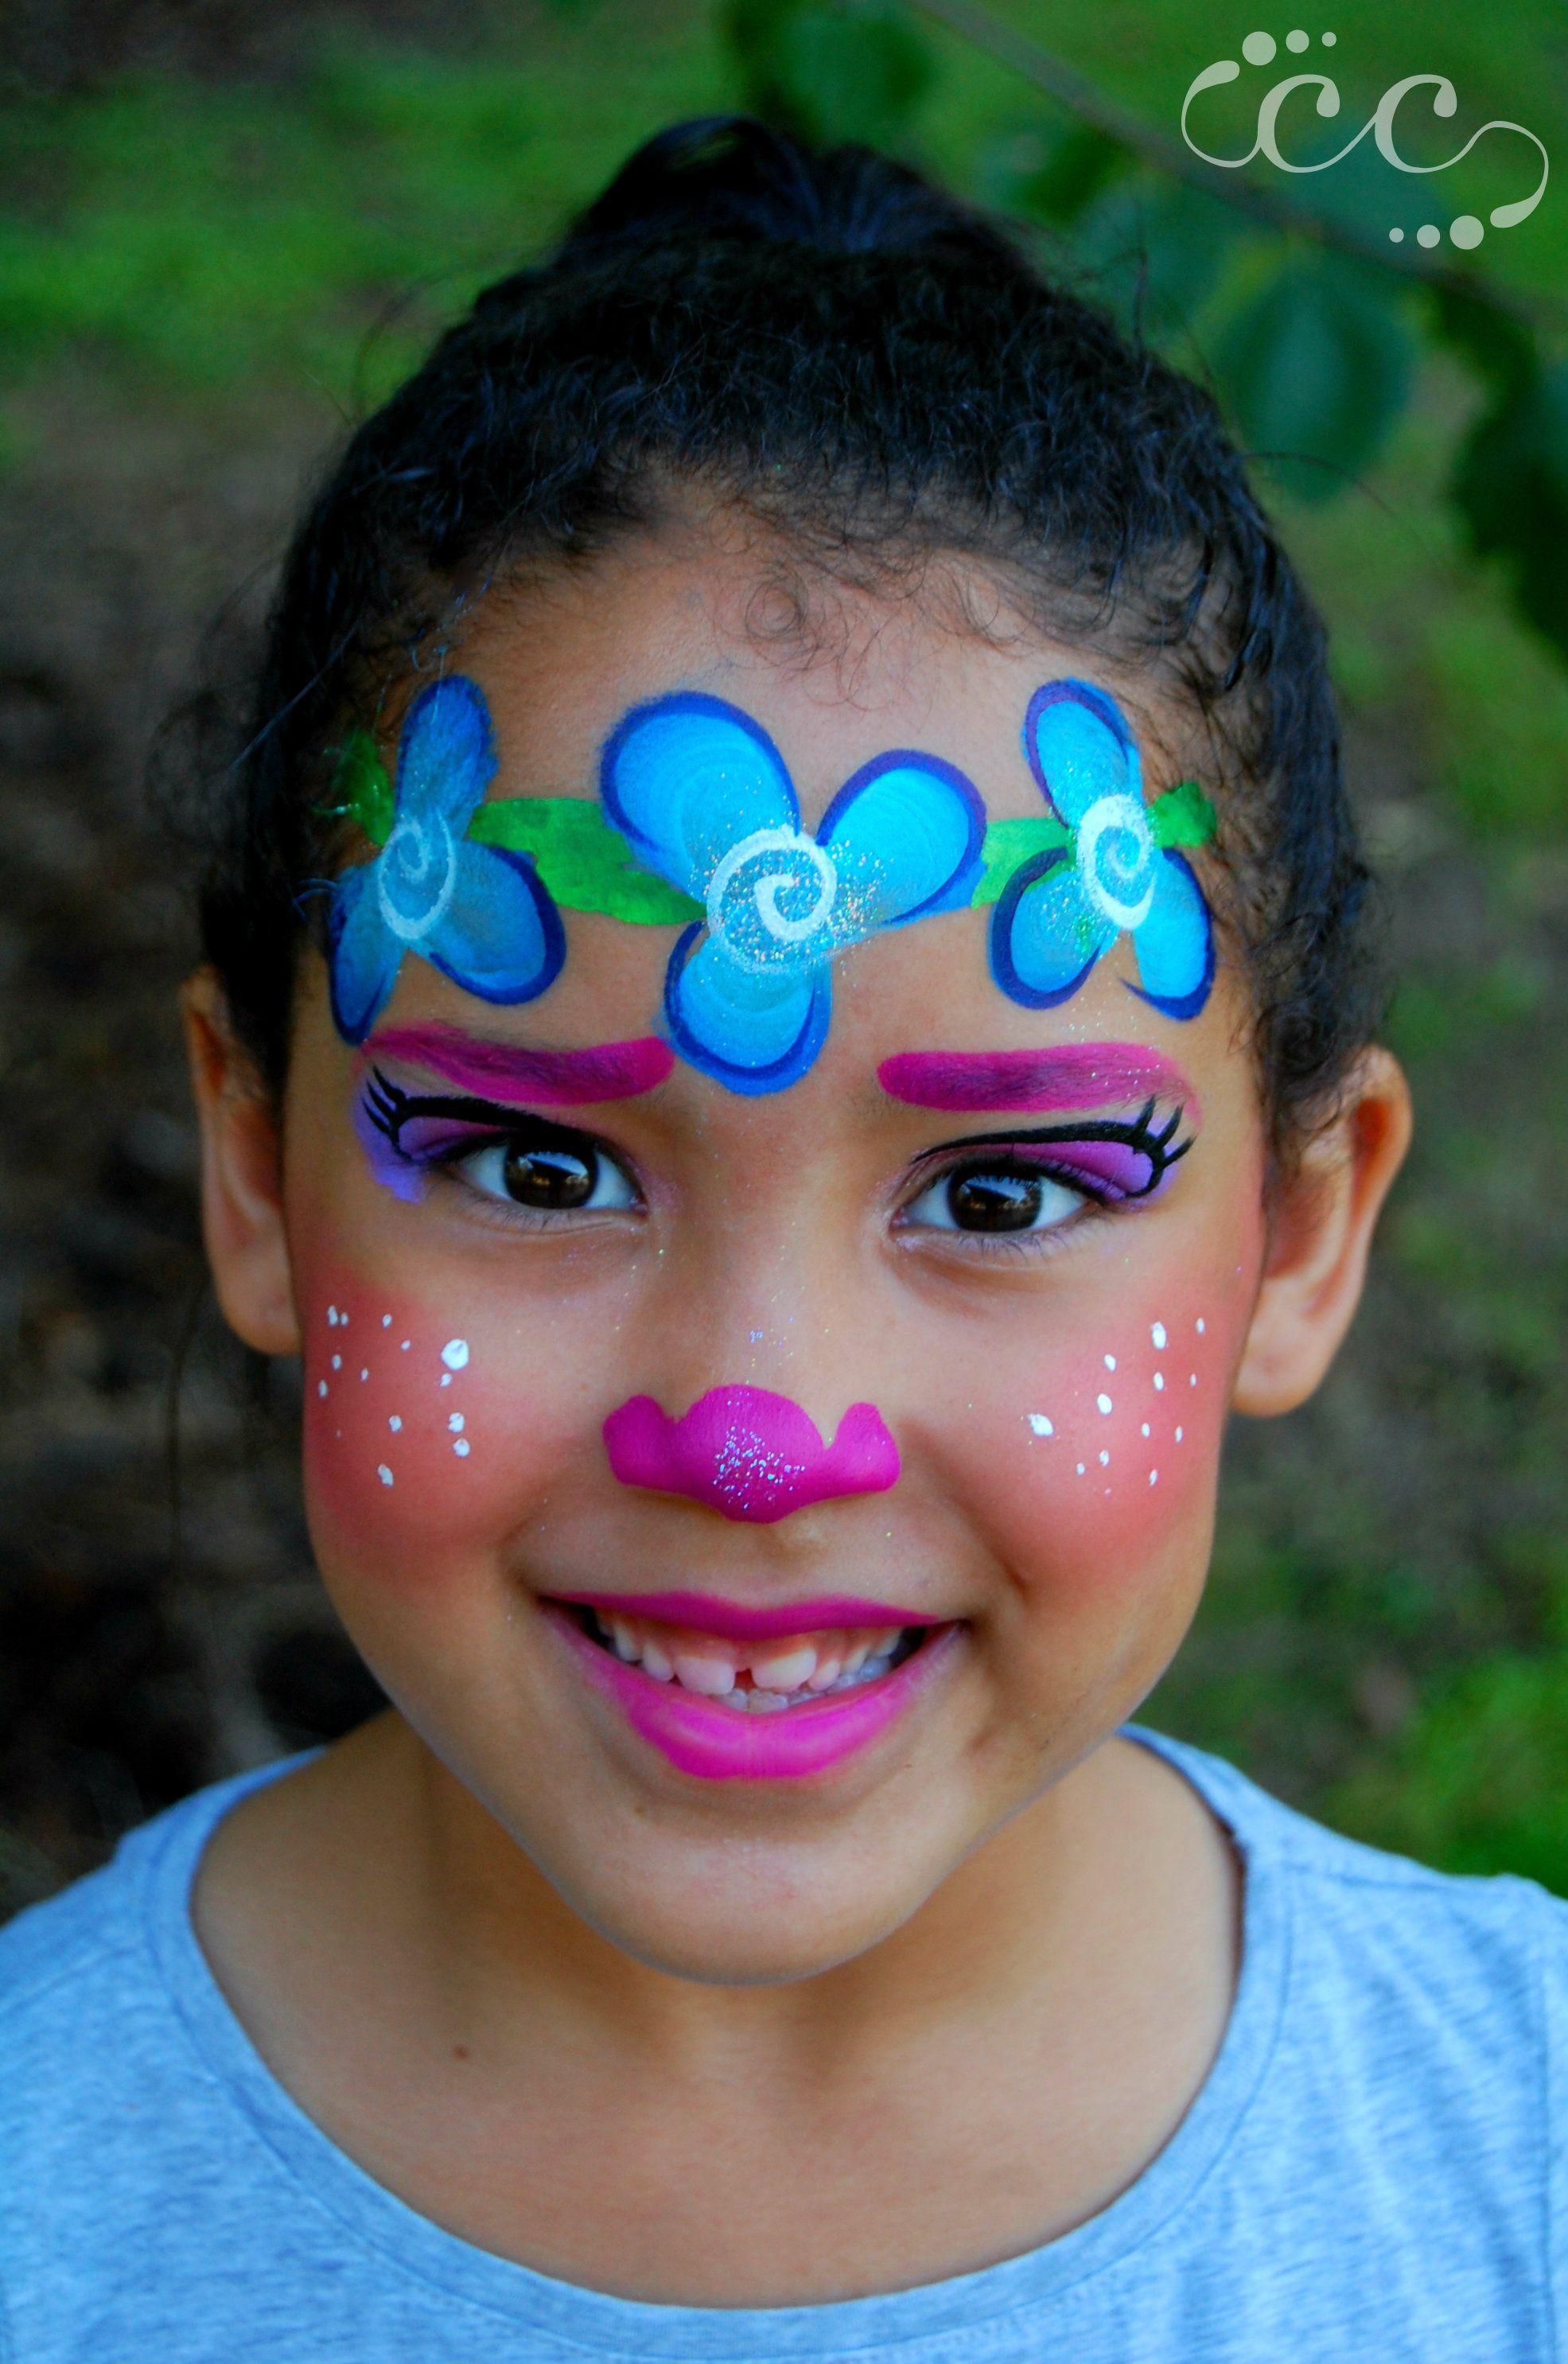 Pink Poppy Troll face paint, painted by Ashlie Alvey of Chubby Cheeks Body Art in Savannah, Georgia #poppy #troll #facepaint #savannah #georgia #artist #facepainter #chubbycheeksart #dollfacepainting